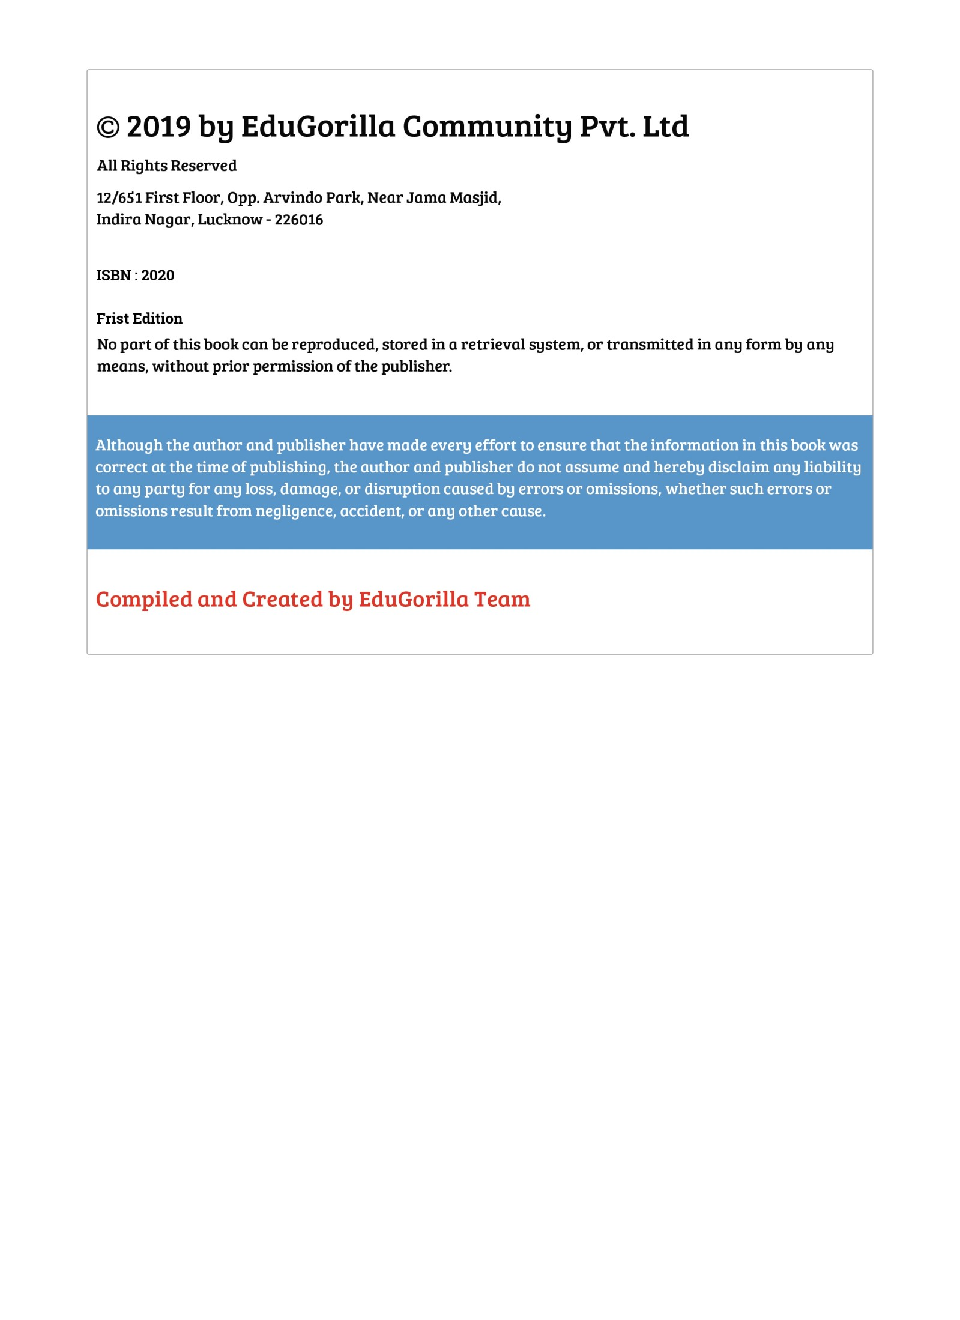 EduGorilla LIC Agent ADO 2020 - 8 Mock Tests -  Latest Edition Practice Kit - Page 4